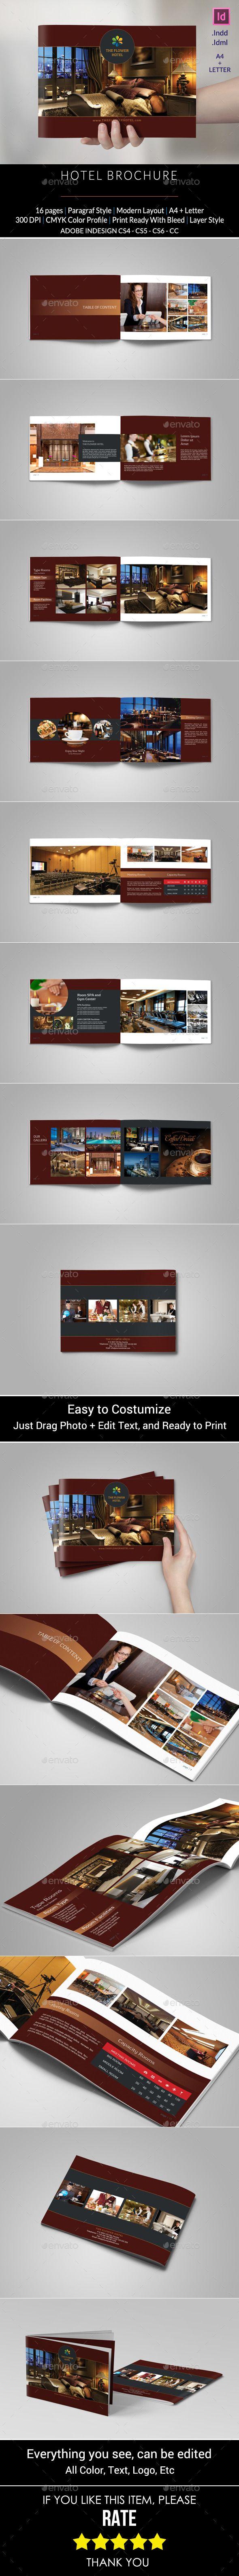 Hotel Brochure Template #design Buy Now: http://graphicriver.net/item/hotel-brochure/12852742?ref=ksioks